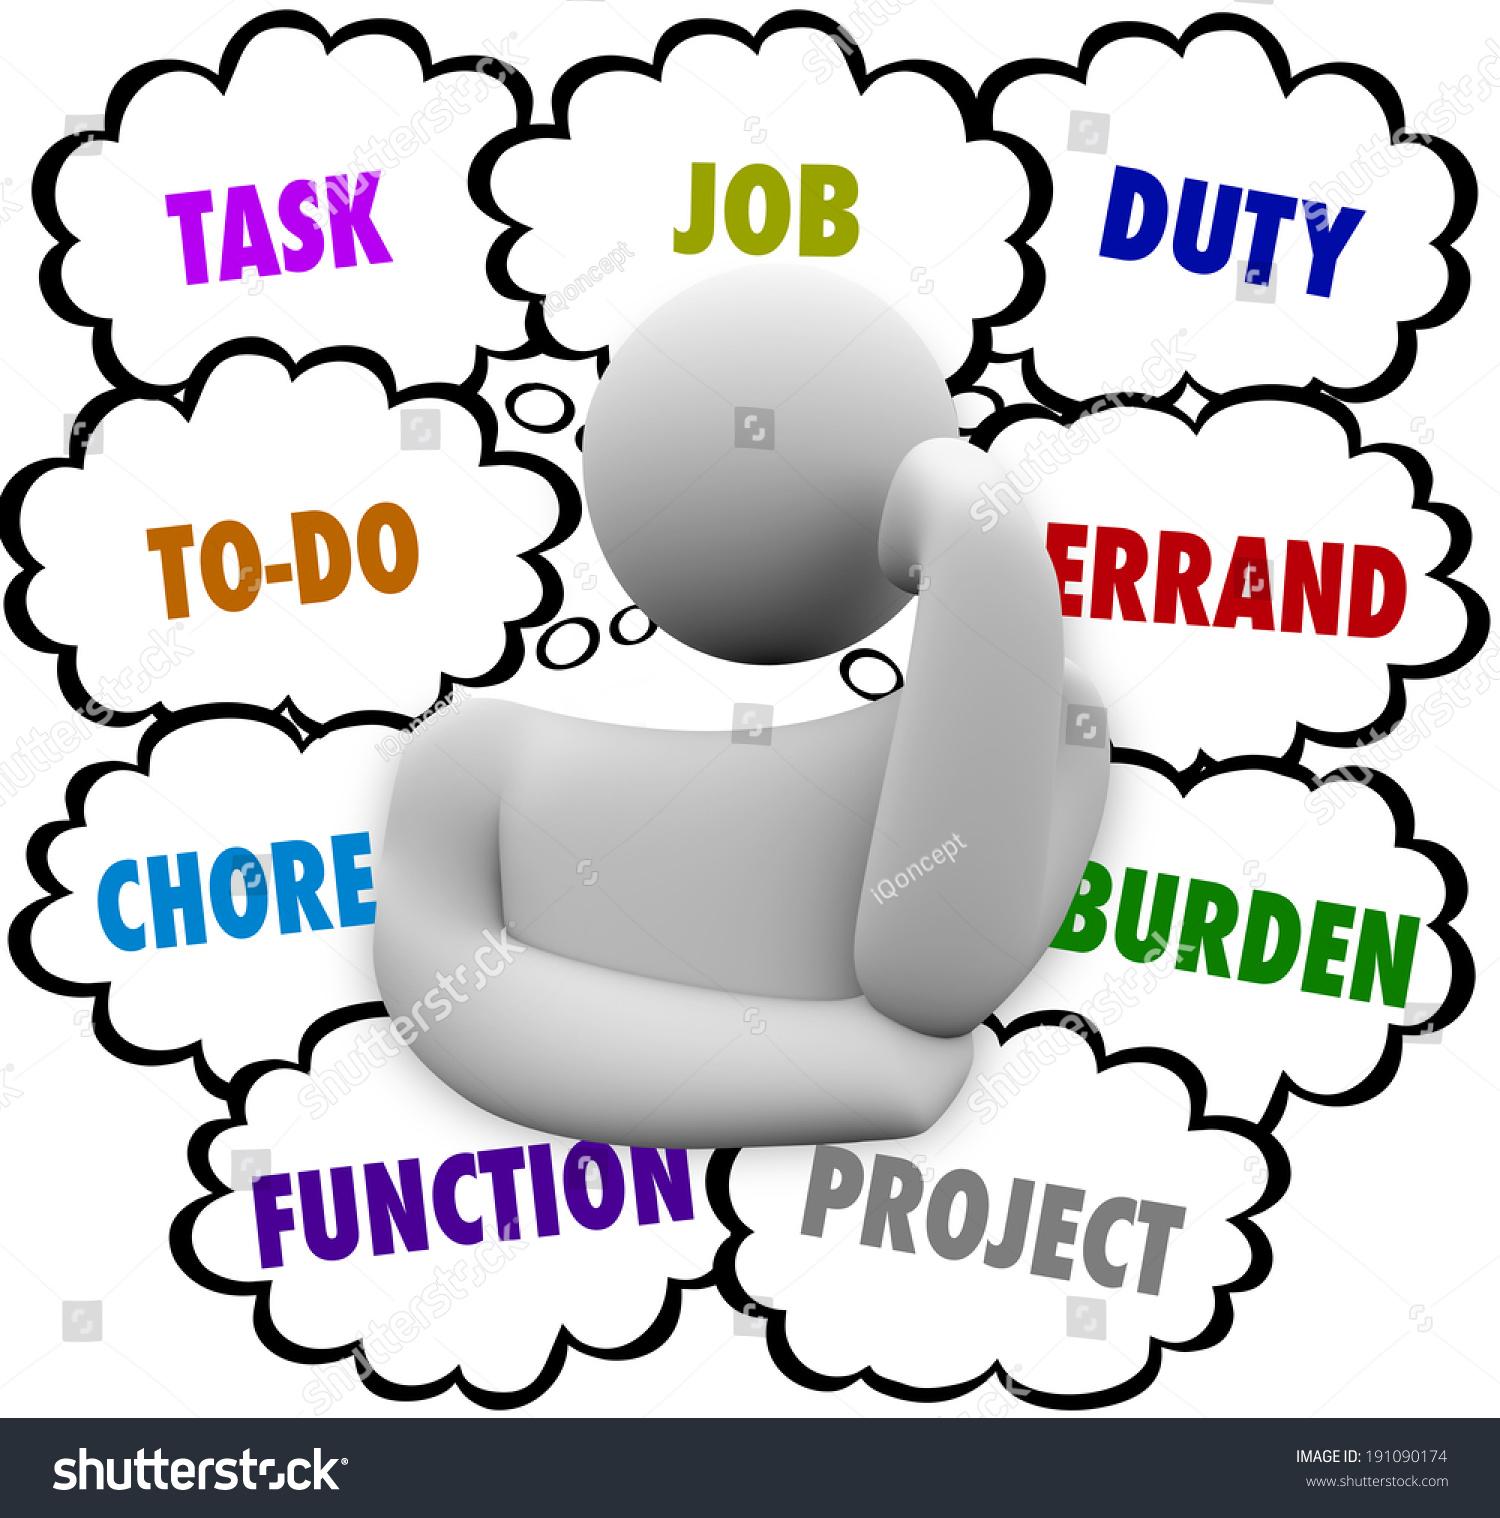 job duty antal expolicenciaslatam co Restaurant Manager Resume Examples Samples task job duty chore todo list stock illustration 191090174